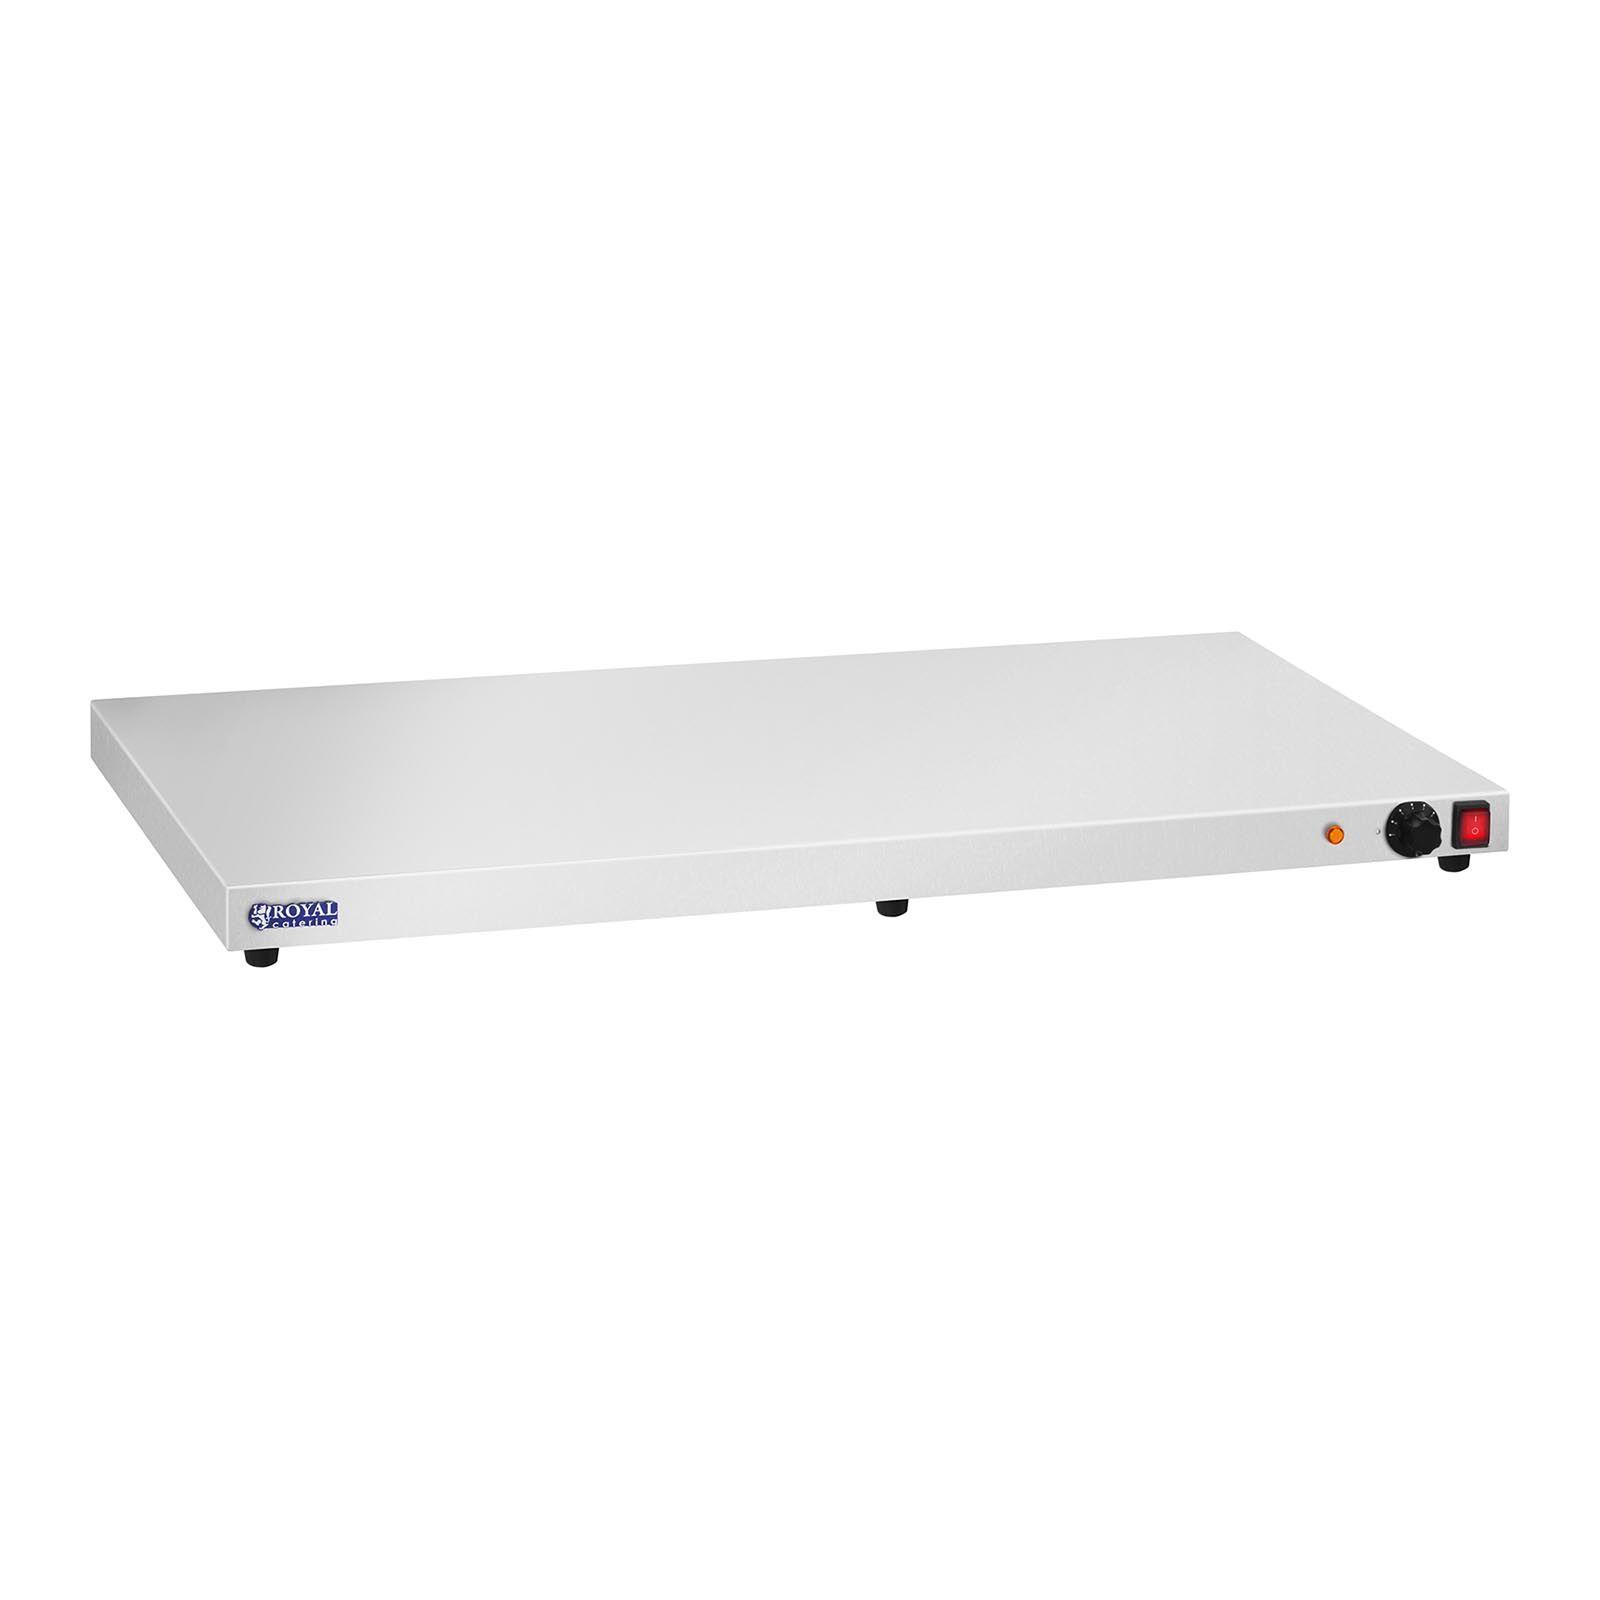 Royal Catering Chauffe-plats en inox - 600 watts - Acier inoxydable - 100 cm RCHP-600E